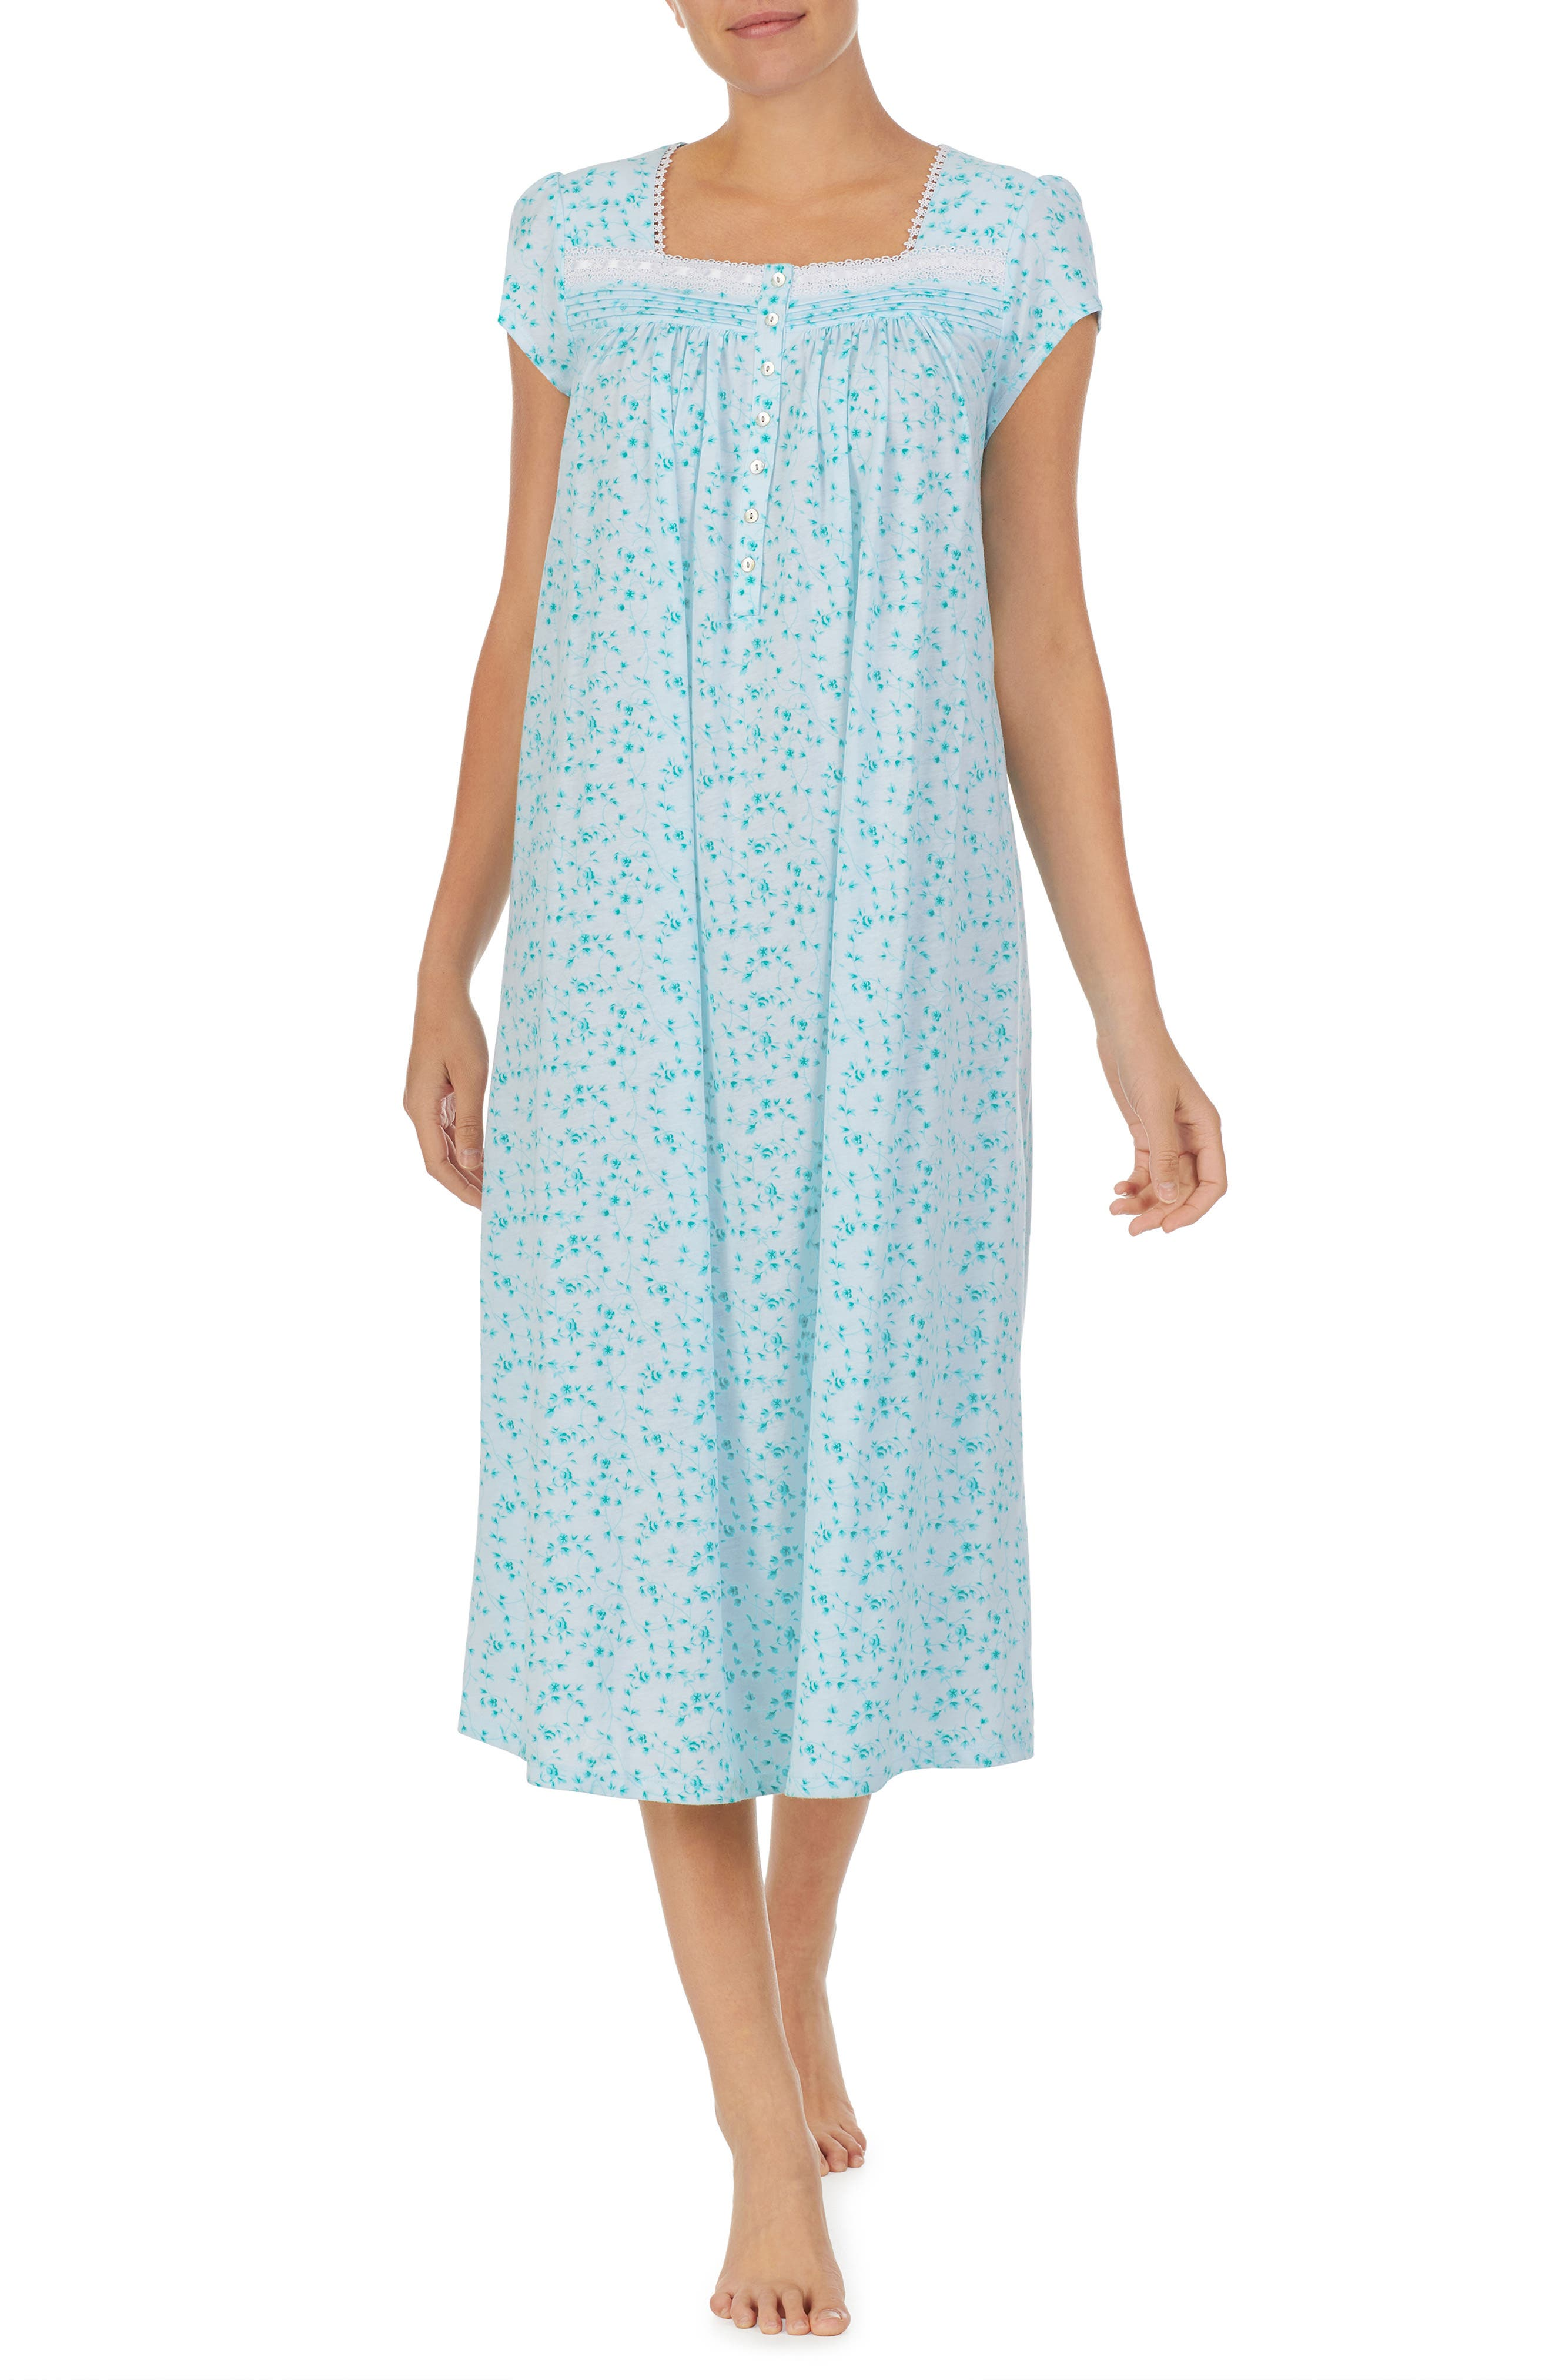 Waltz Cap Sleeve Cotton Jersey Nightgown